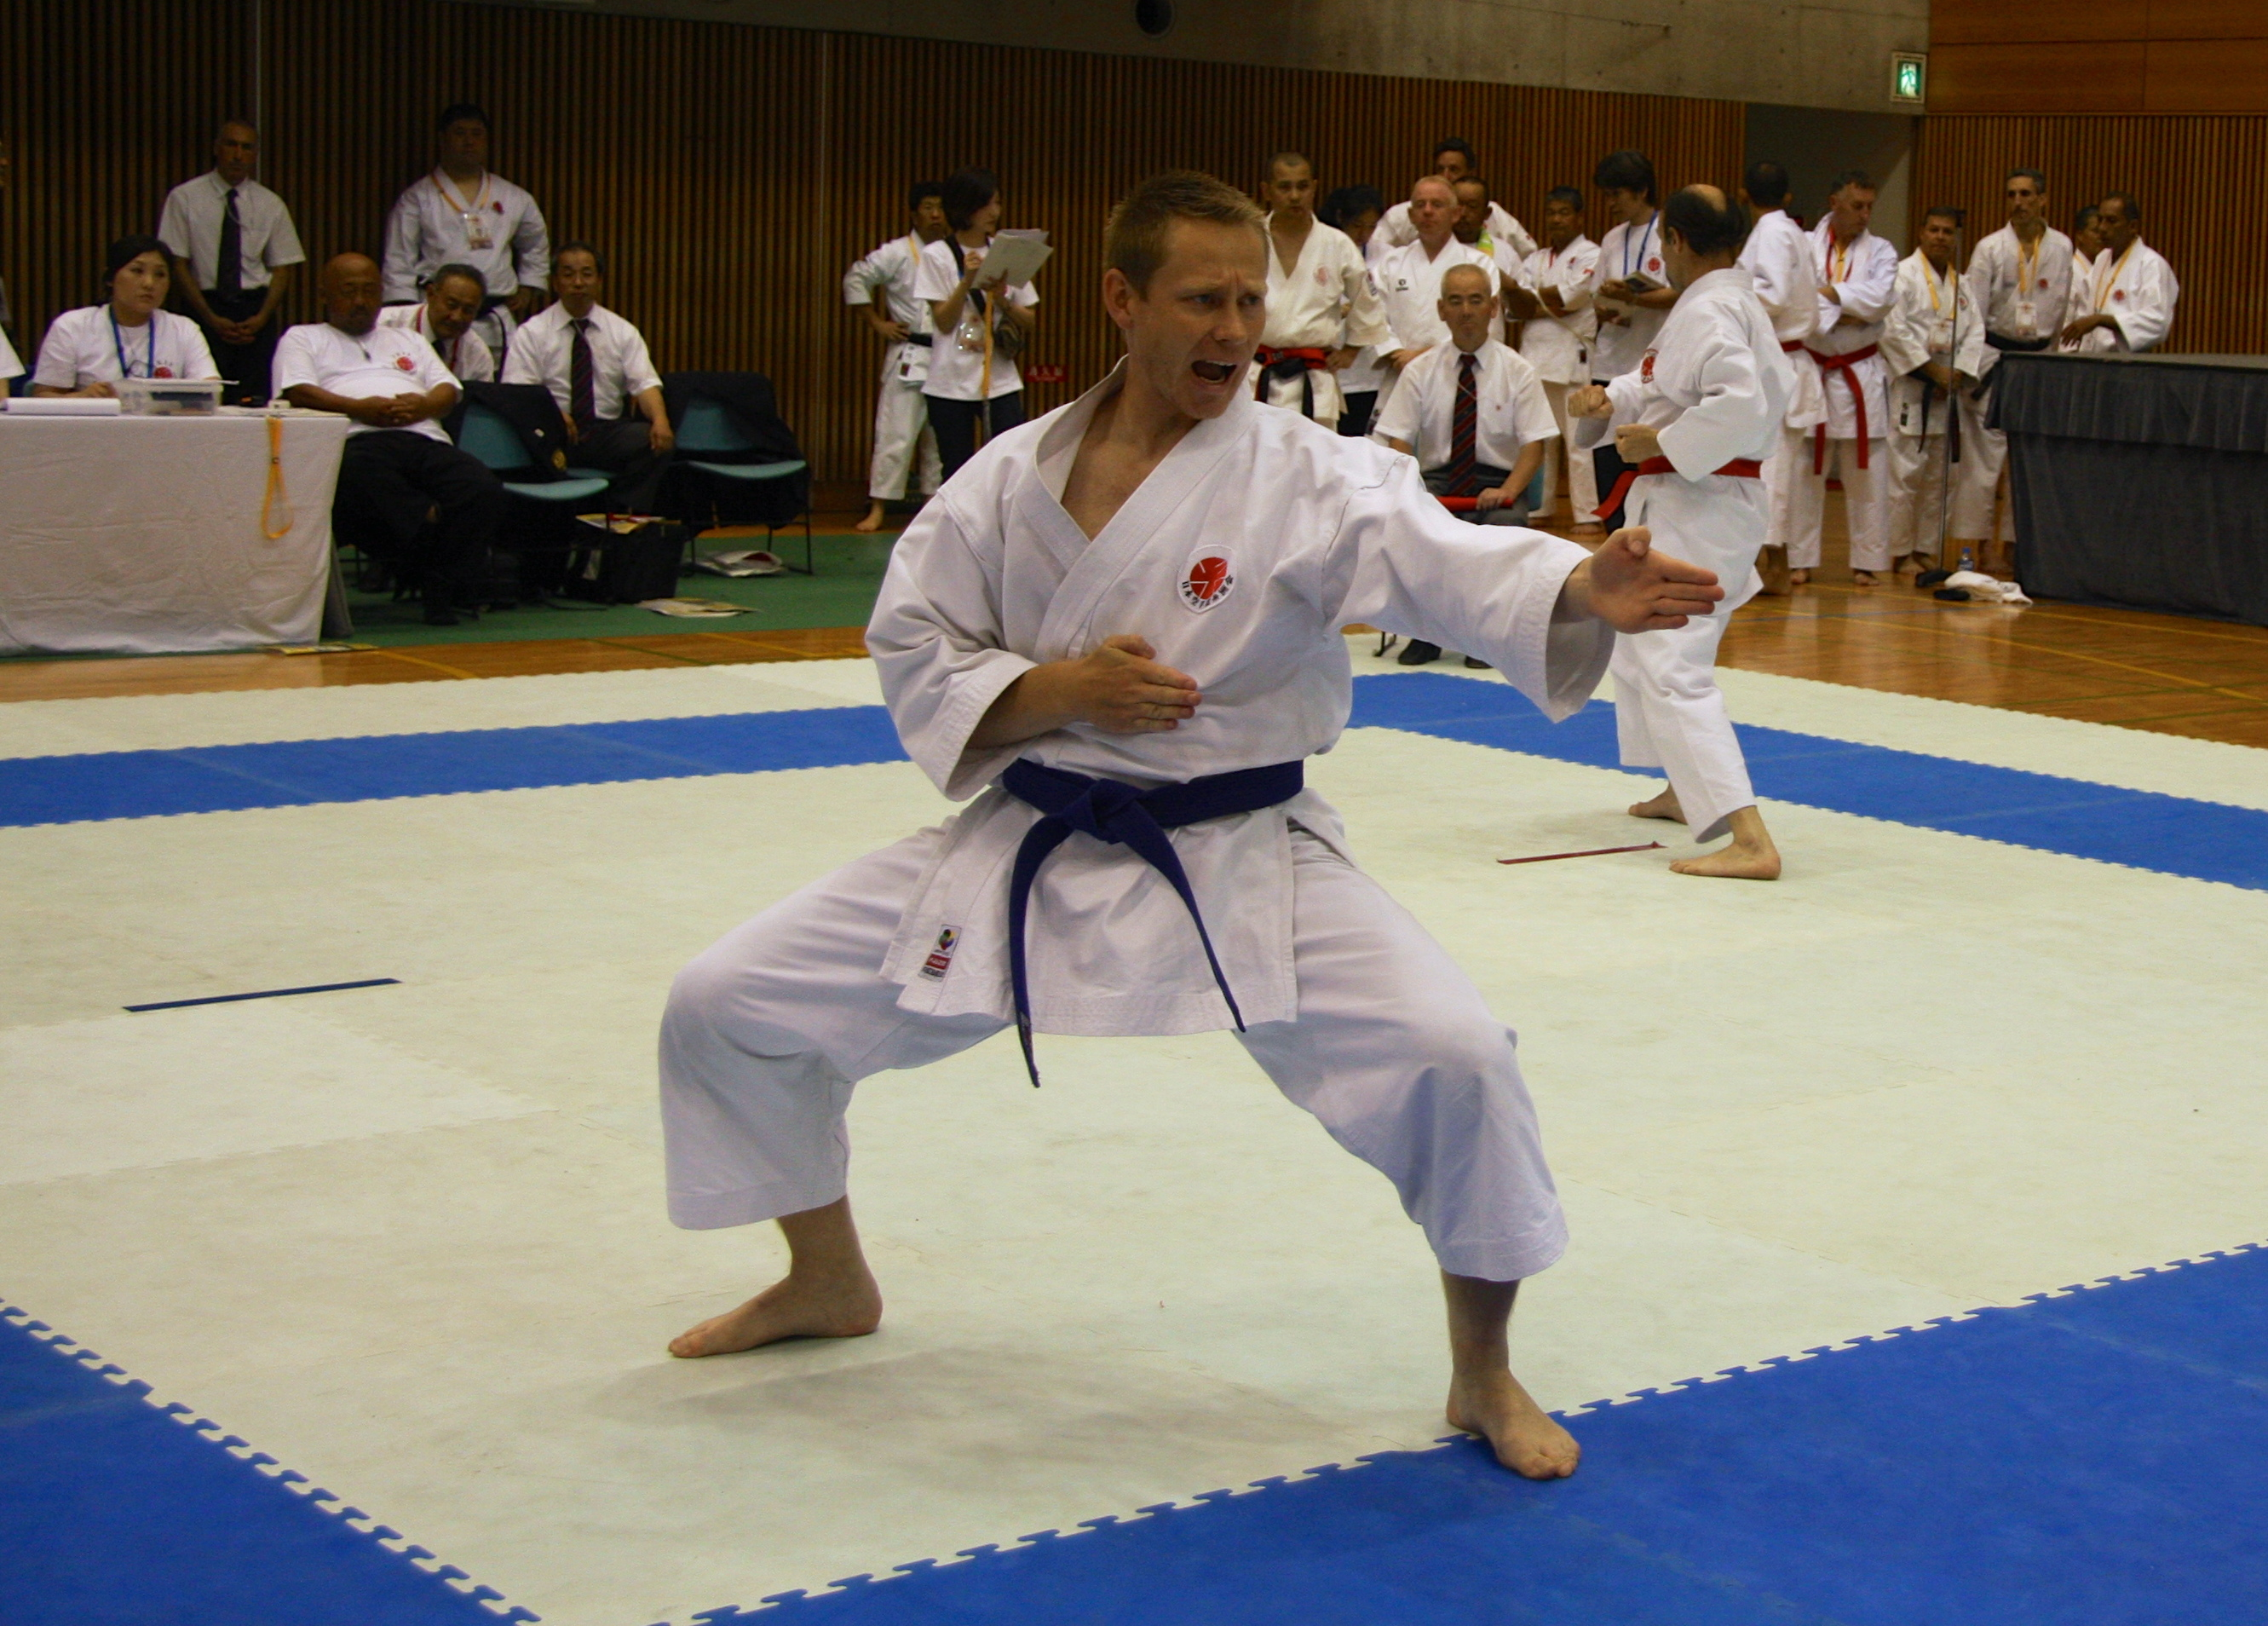 Beretning fra Itosu-Ryu VM afholdt i Osaka, Japan